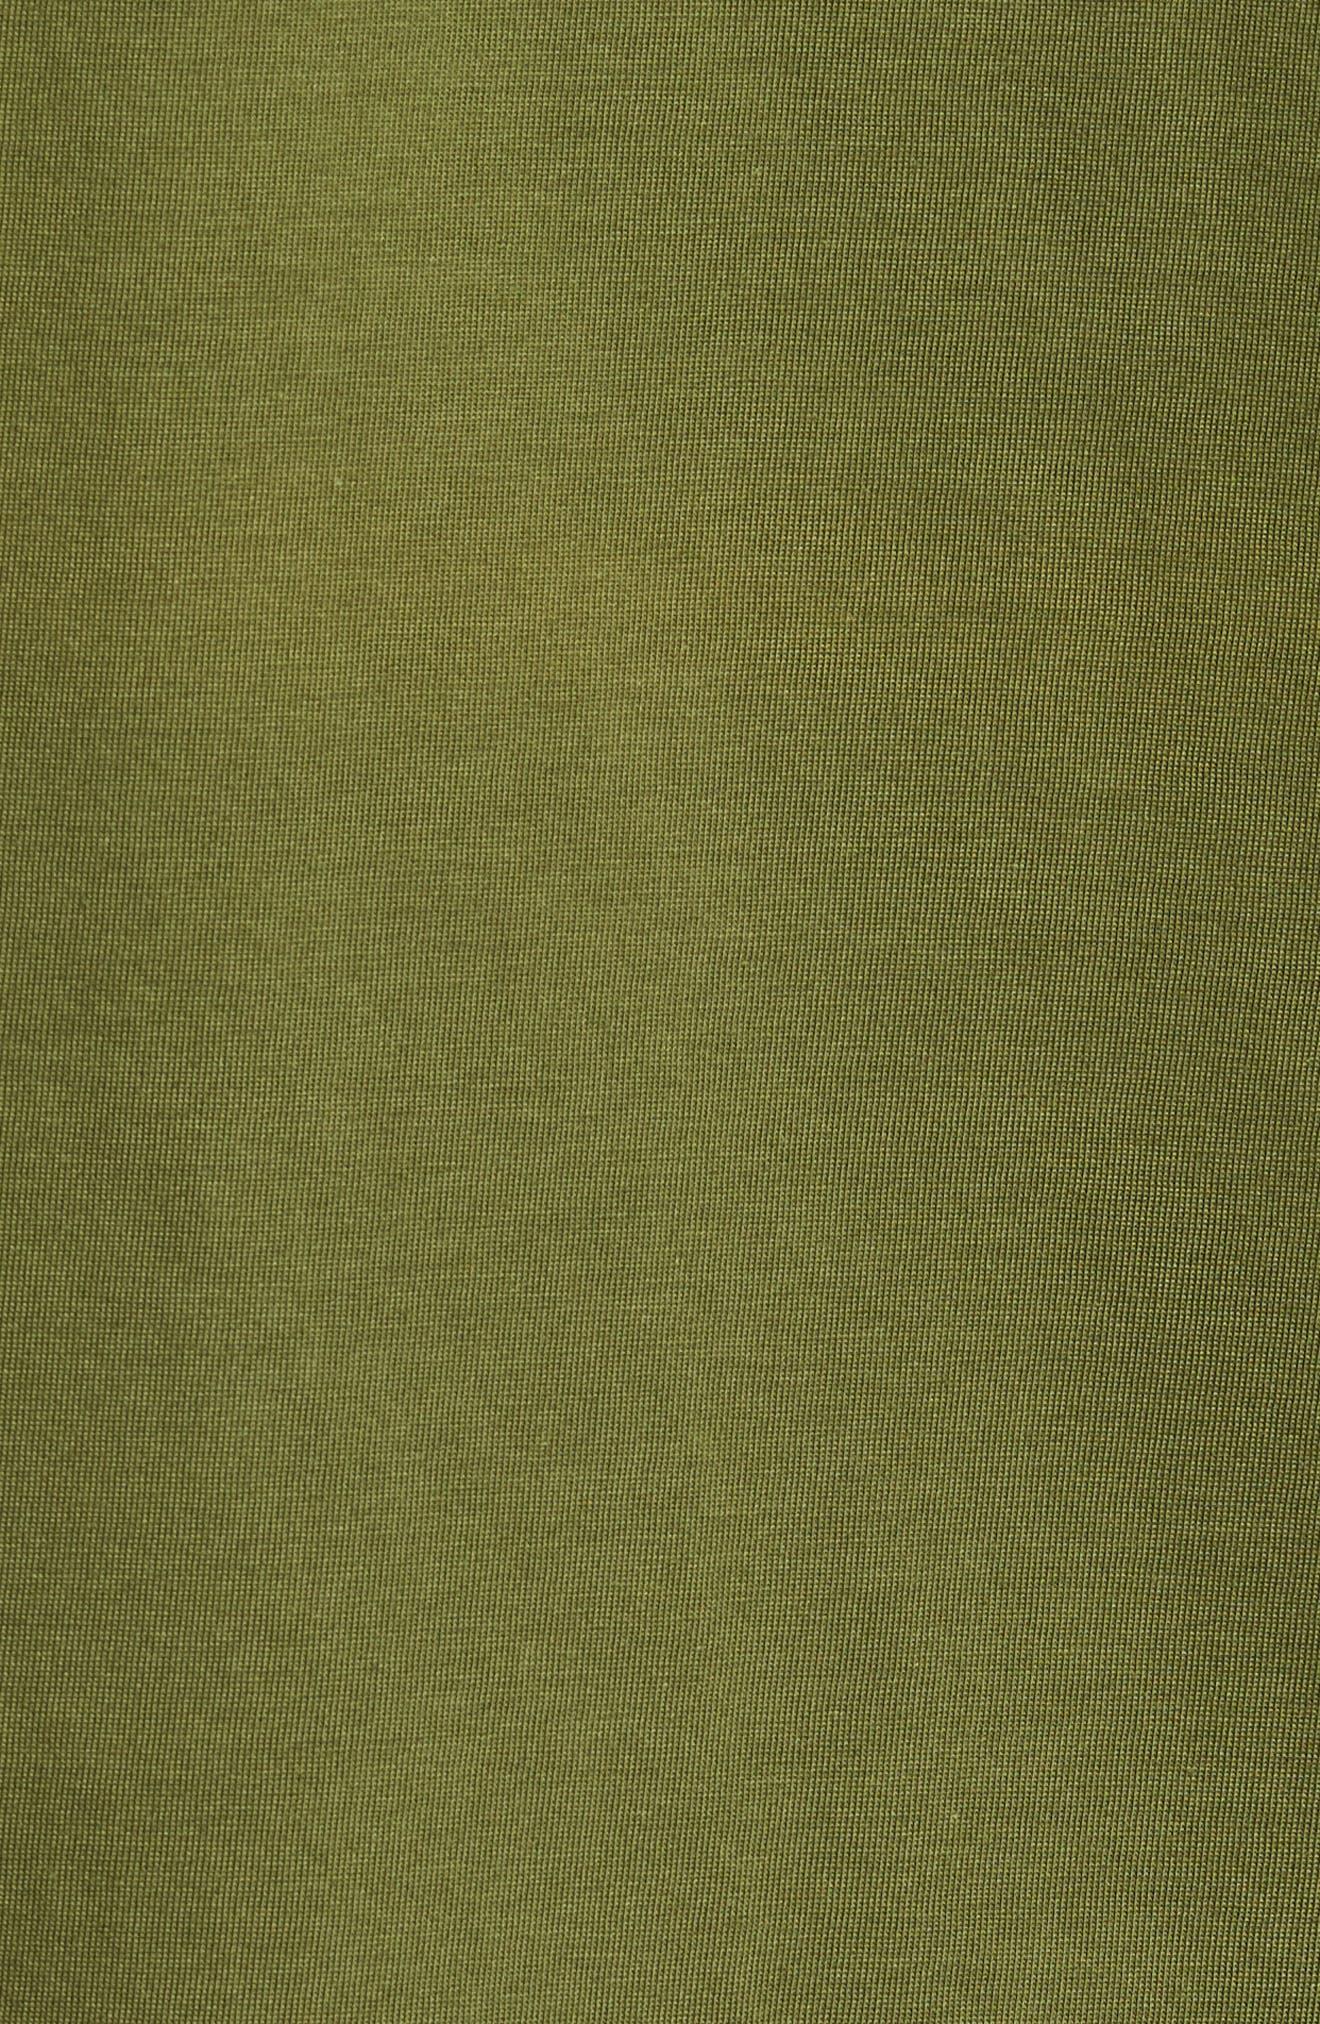 V-Neck Cotton T-Shirt,                             Alternate thumbnail 5, color,                             305